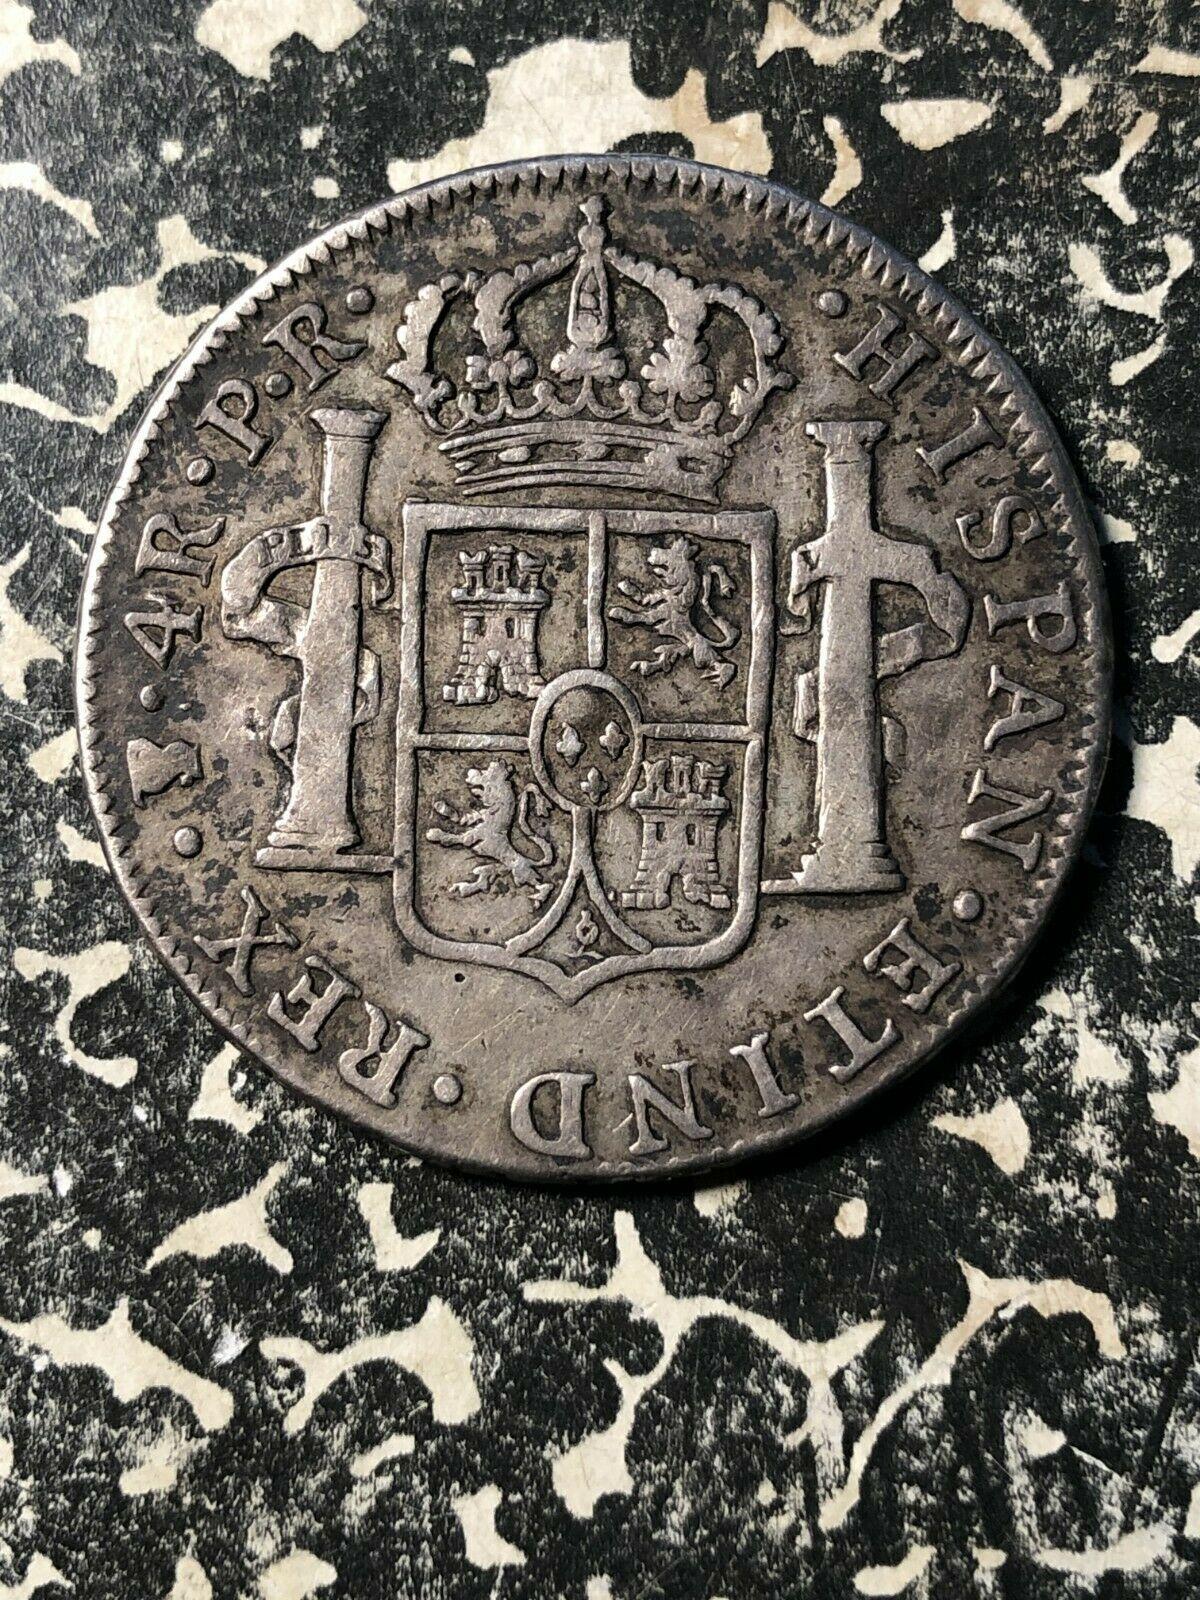 1778-PR Bolivia 4 Reales Lot#JM1074 Silver! Scarce! Chopmarked